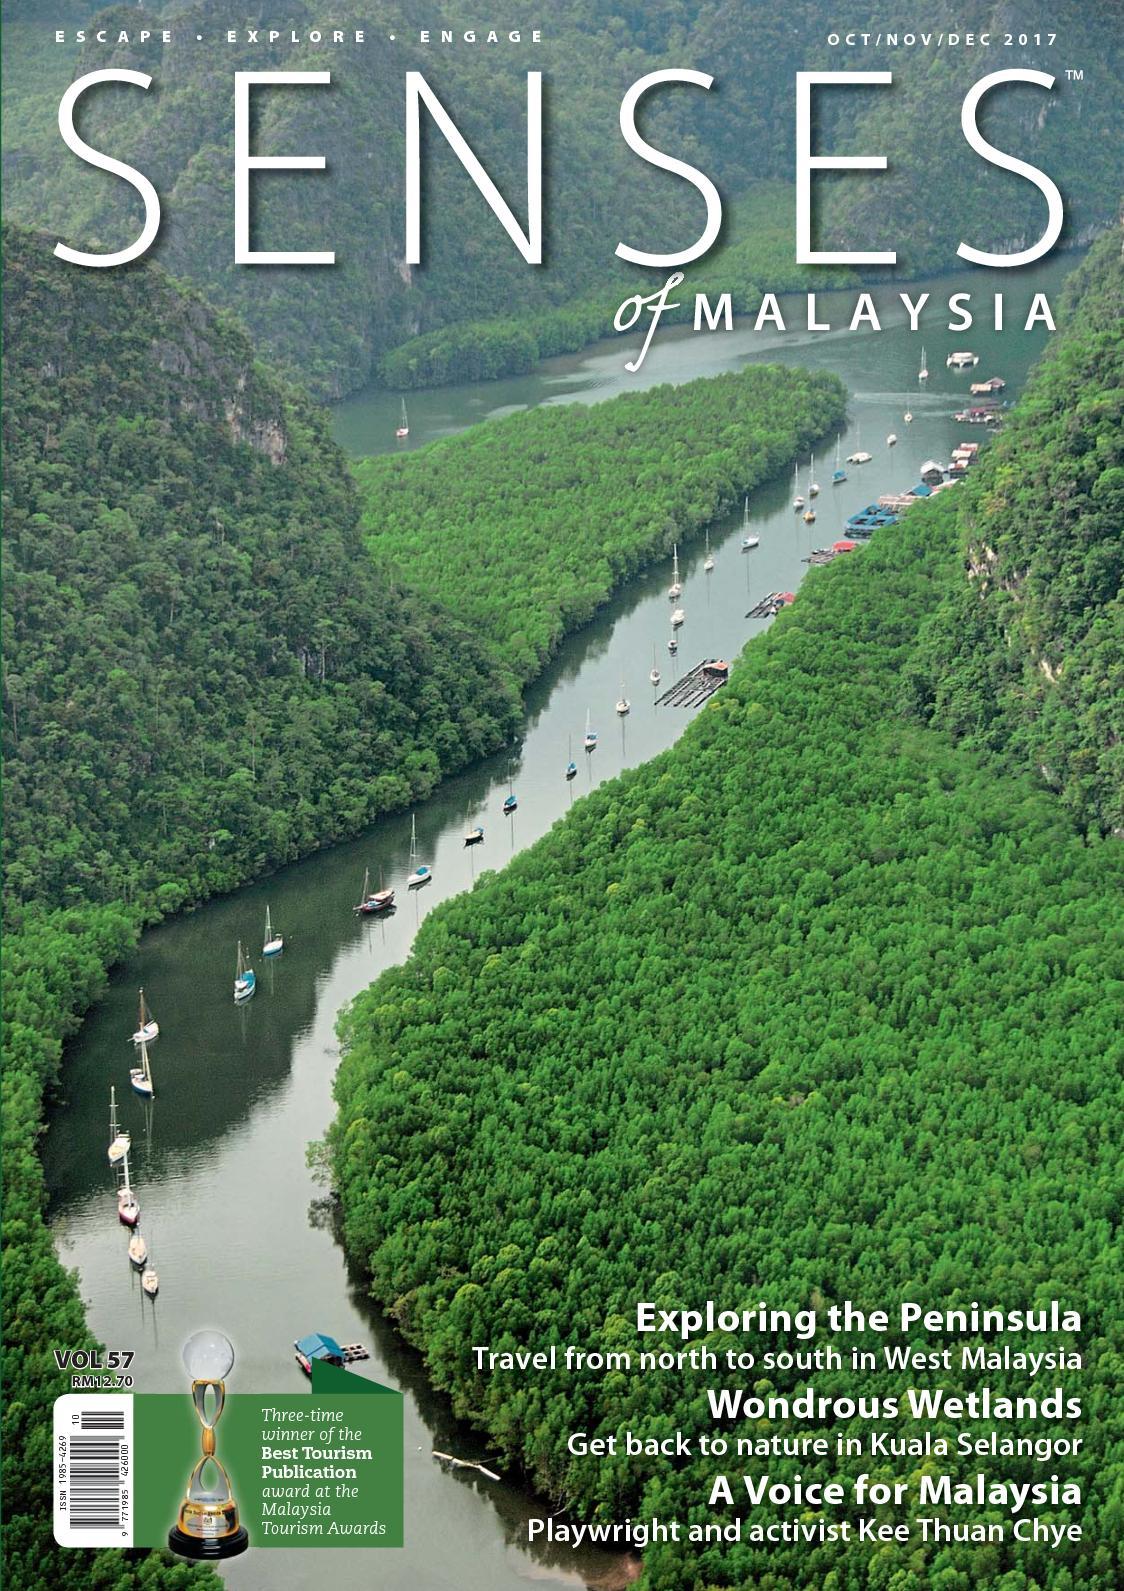 Calamo Senses Of Malaysia Oct Nov Dec 2017 Tiket 01 Day Legoland Combo Theme Park Water Anak 3 11